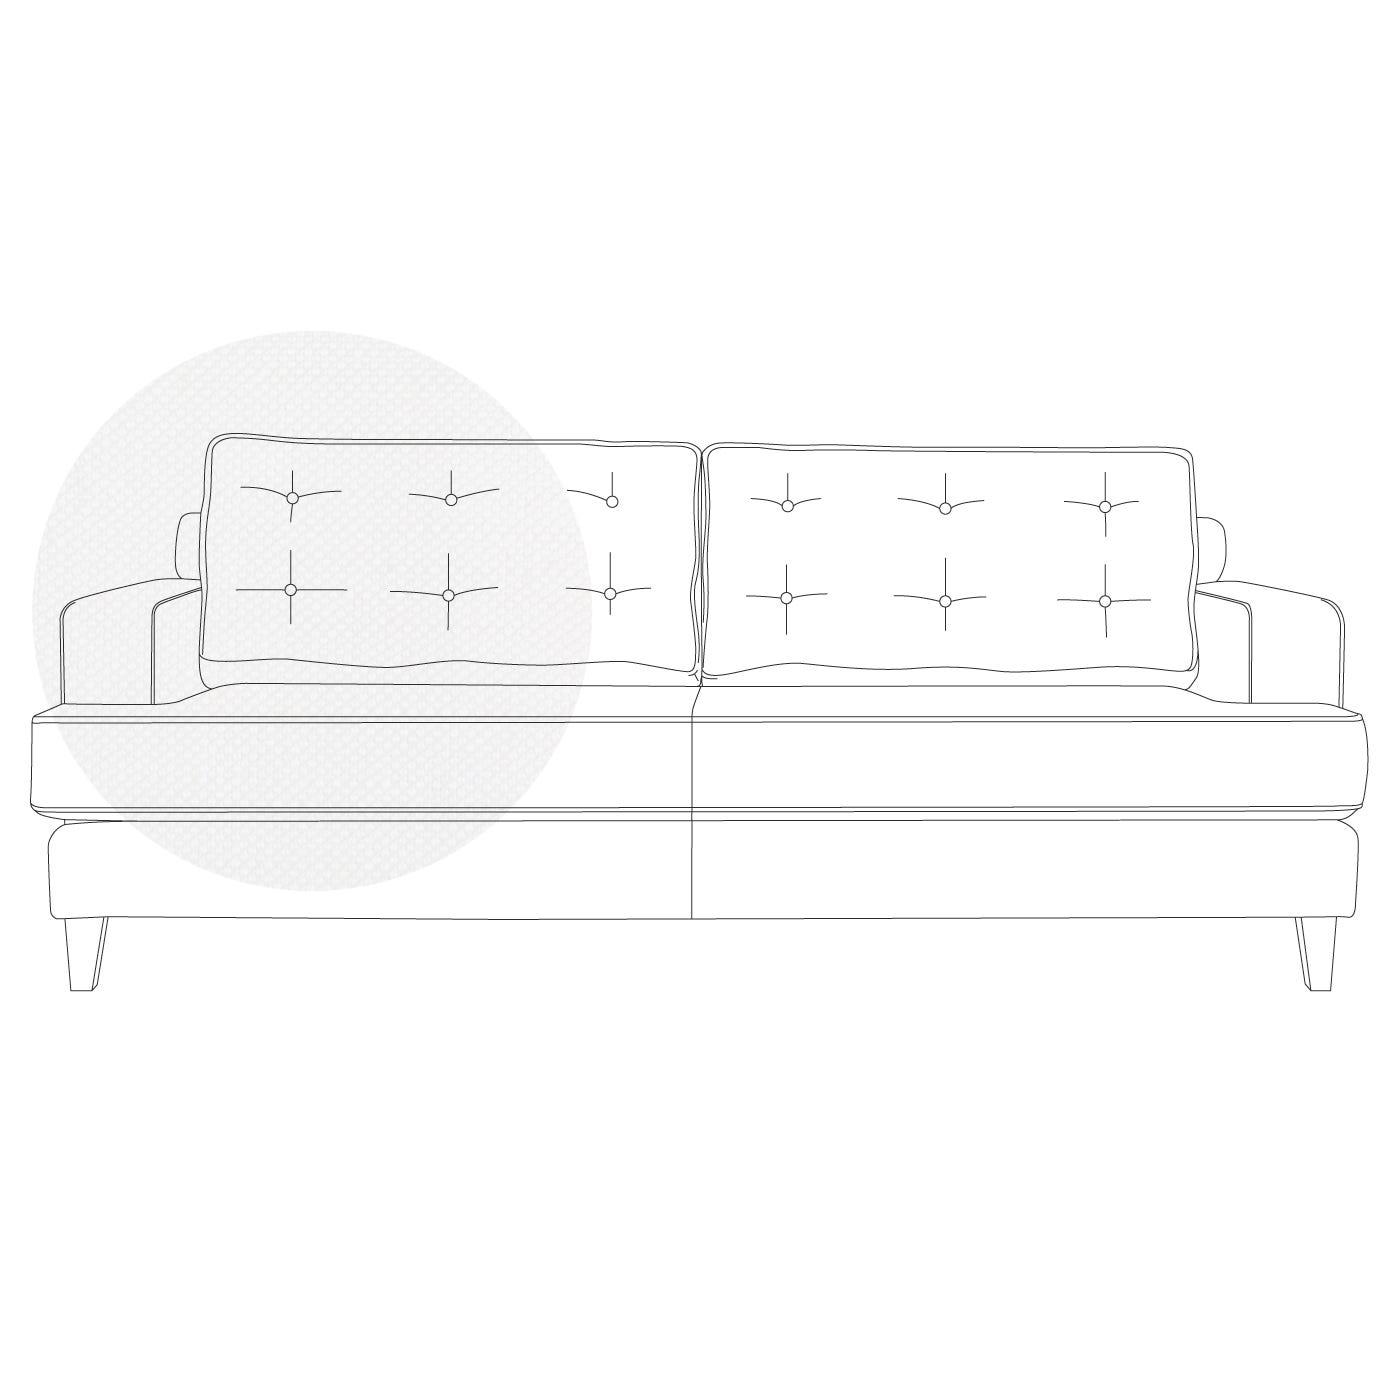 Mistral 3 Seater Sofa